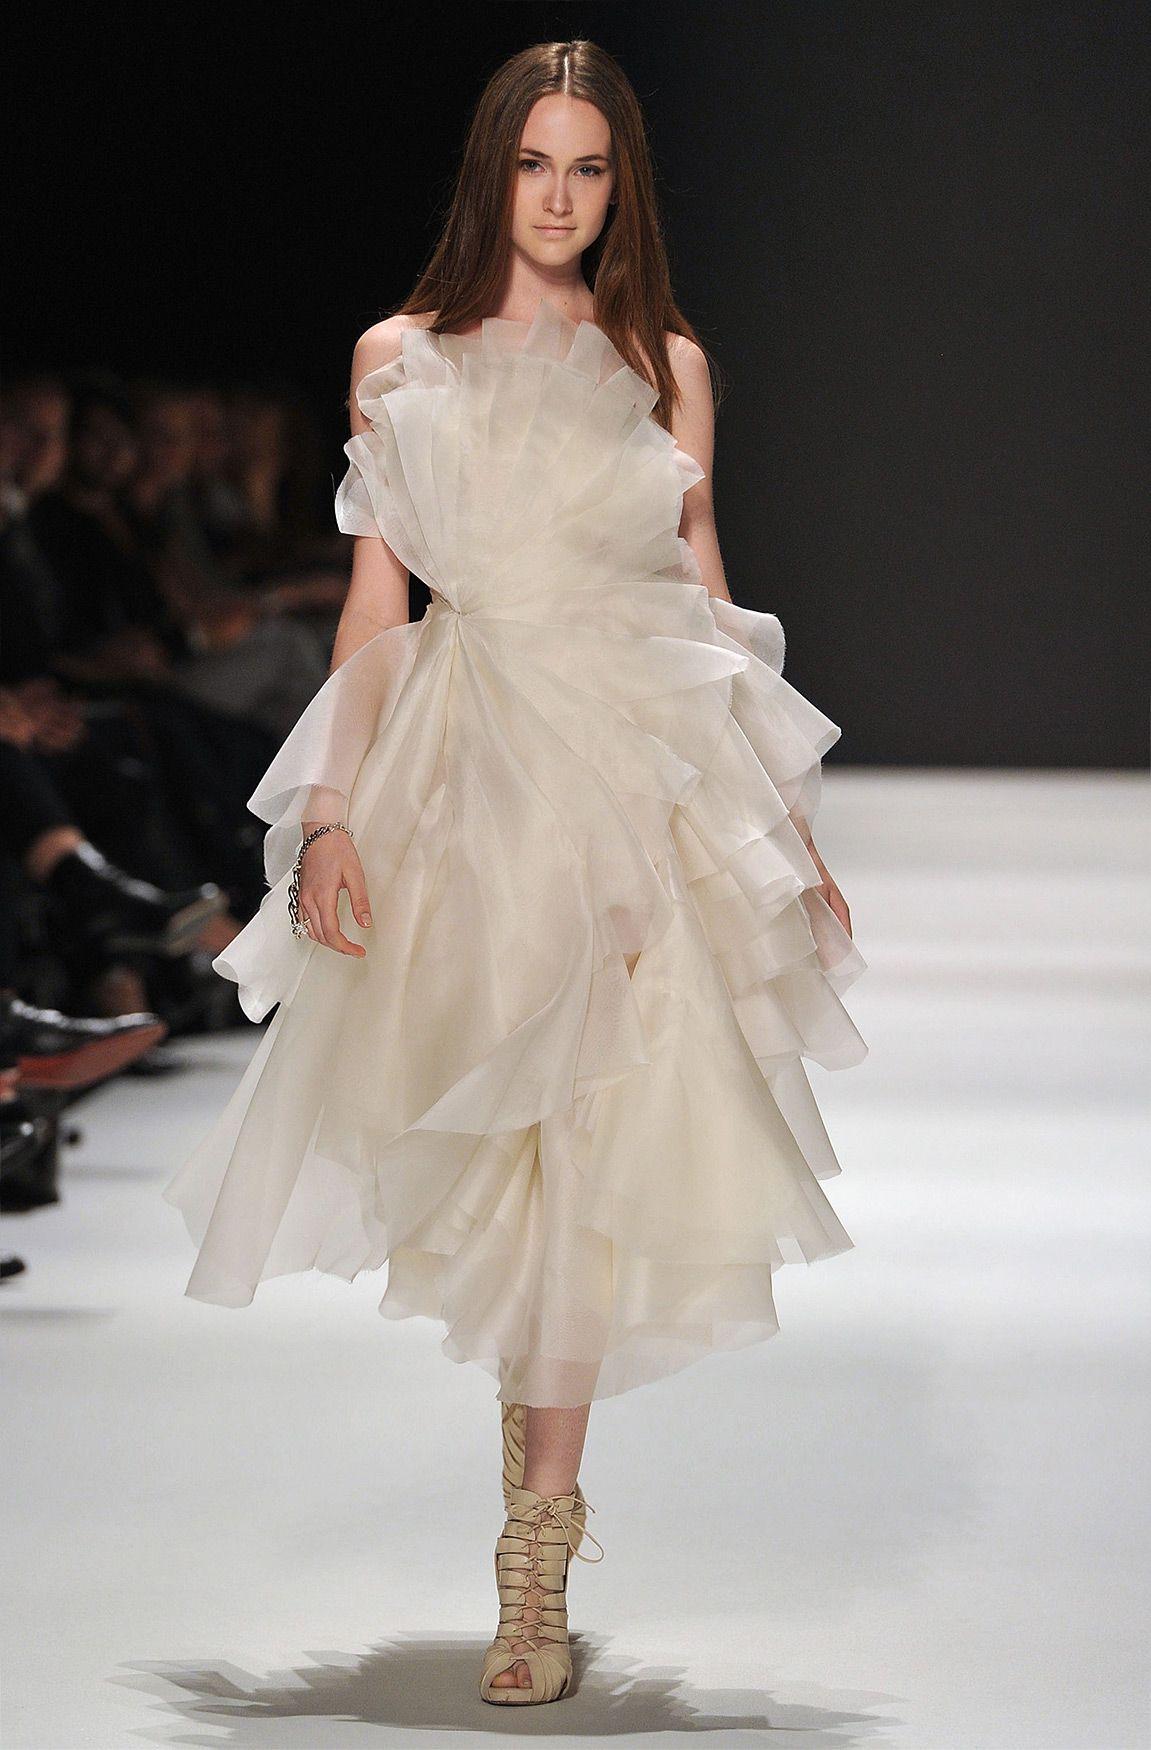 Exploded Flower Dress, kaviar gauche | wedding | Pinterest | Flower ...